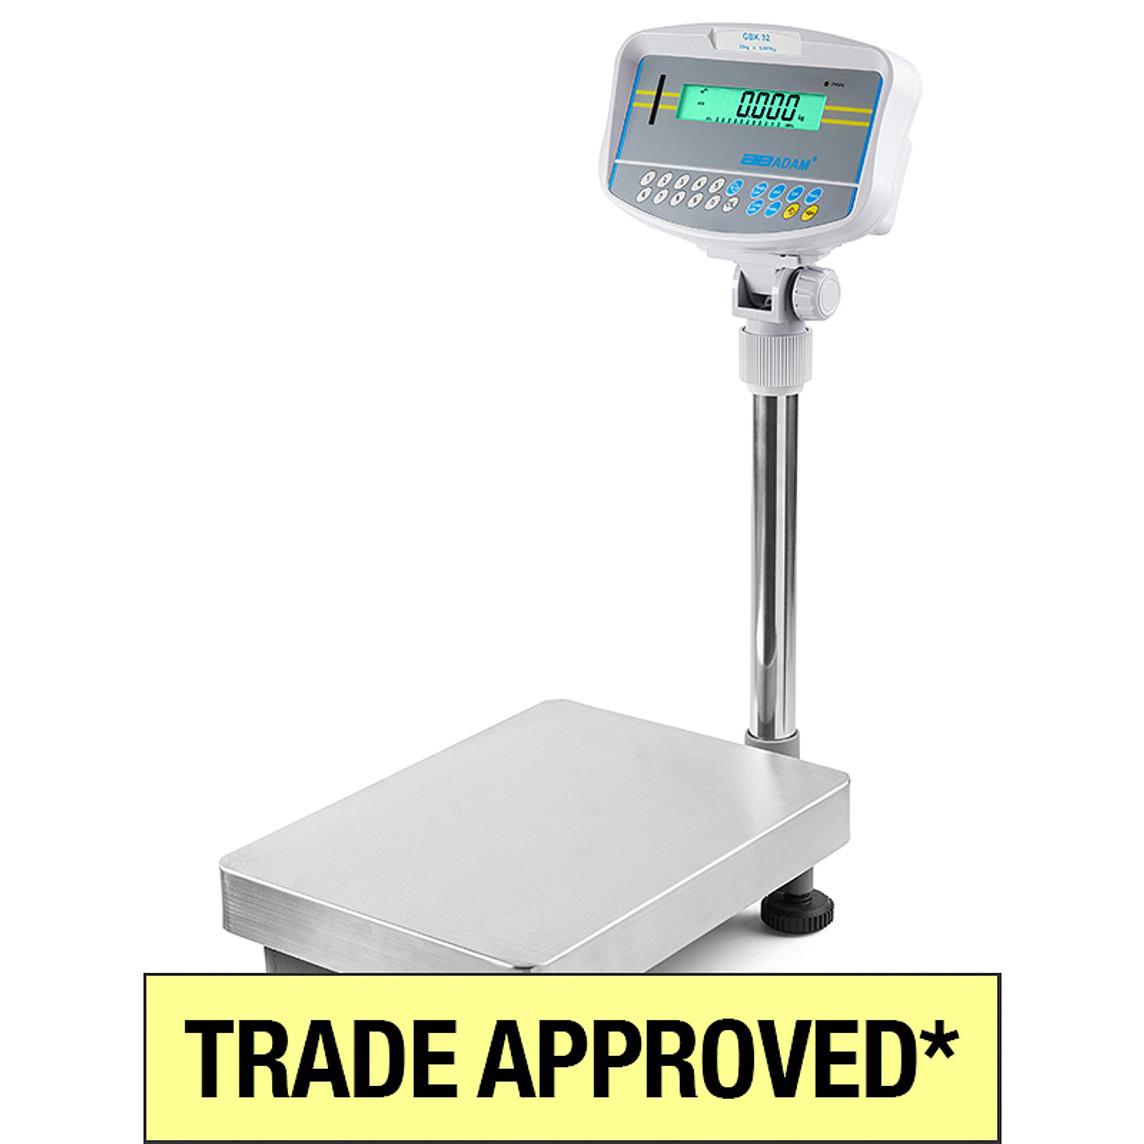 Adam GBK Trade Approved Platform Scales Photo: ©The Scale Shop Australia